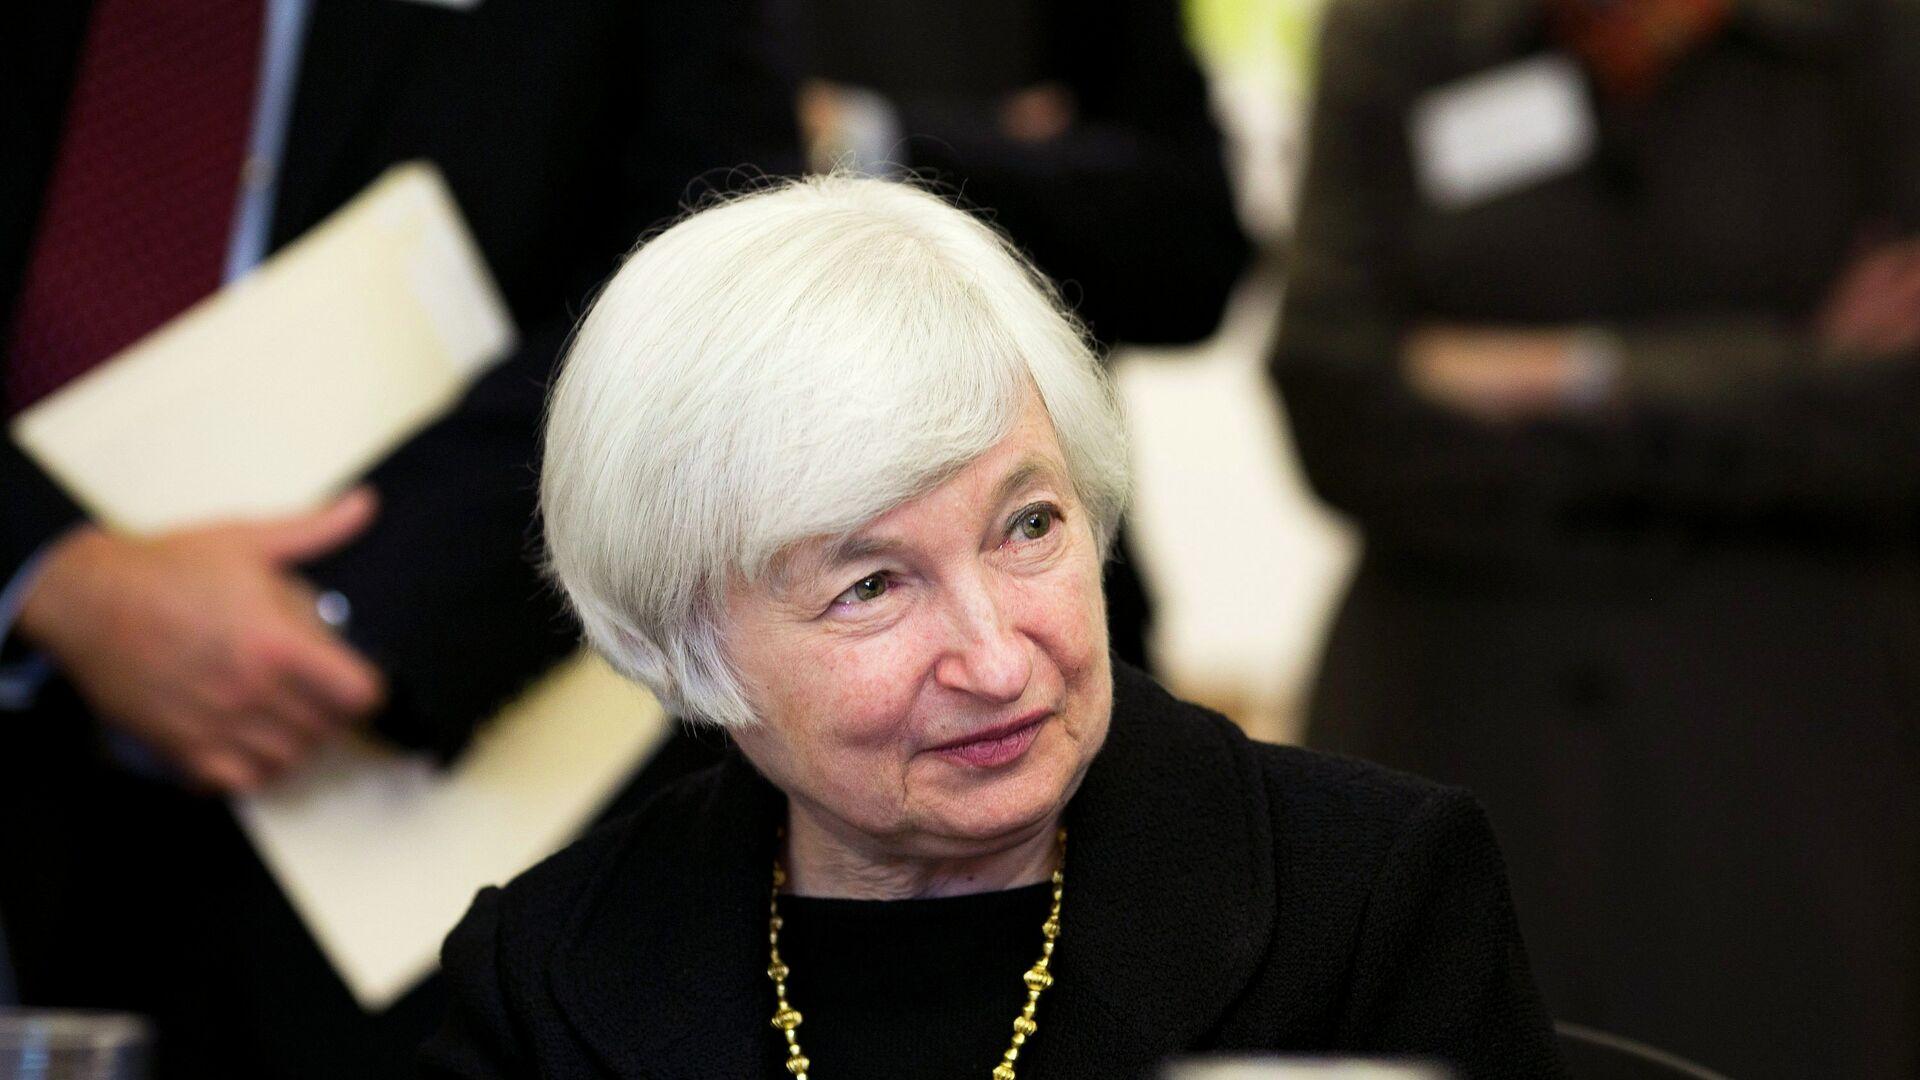 Janet Yellen, capo del Federal Reserve - Sputnik Italia, 1920, 21.09.2021